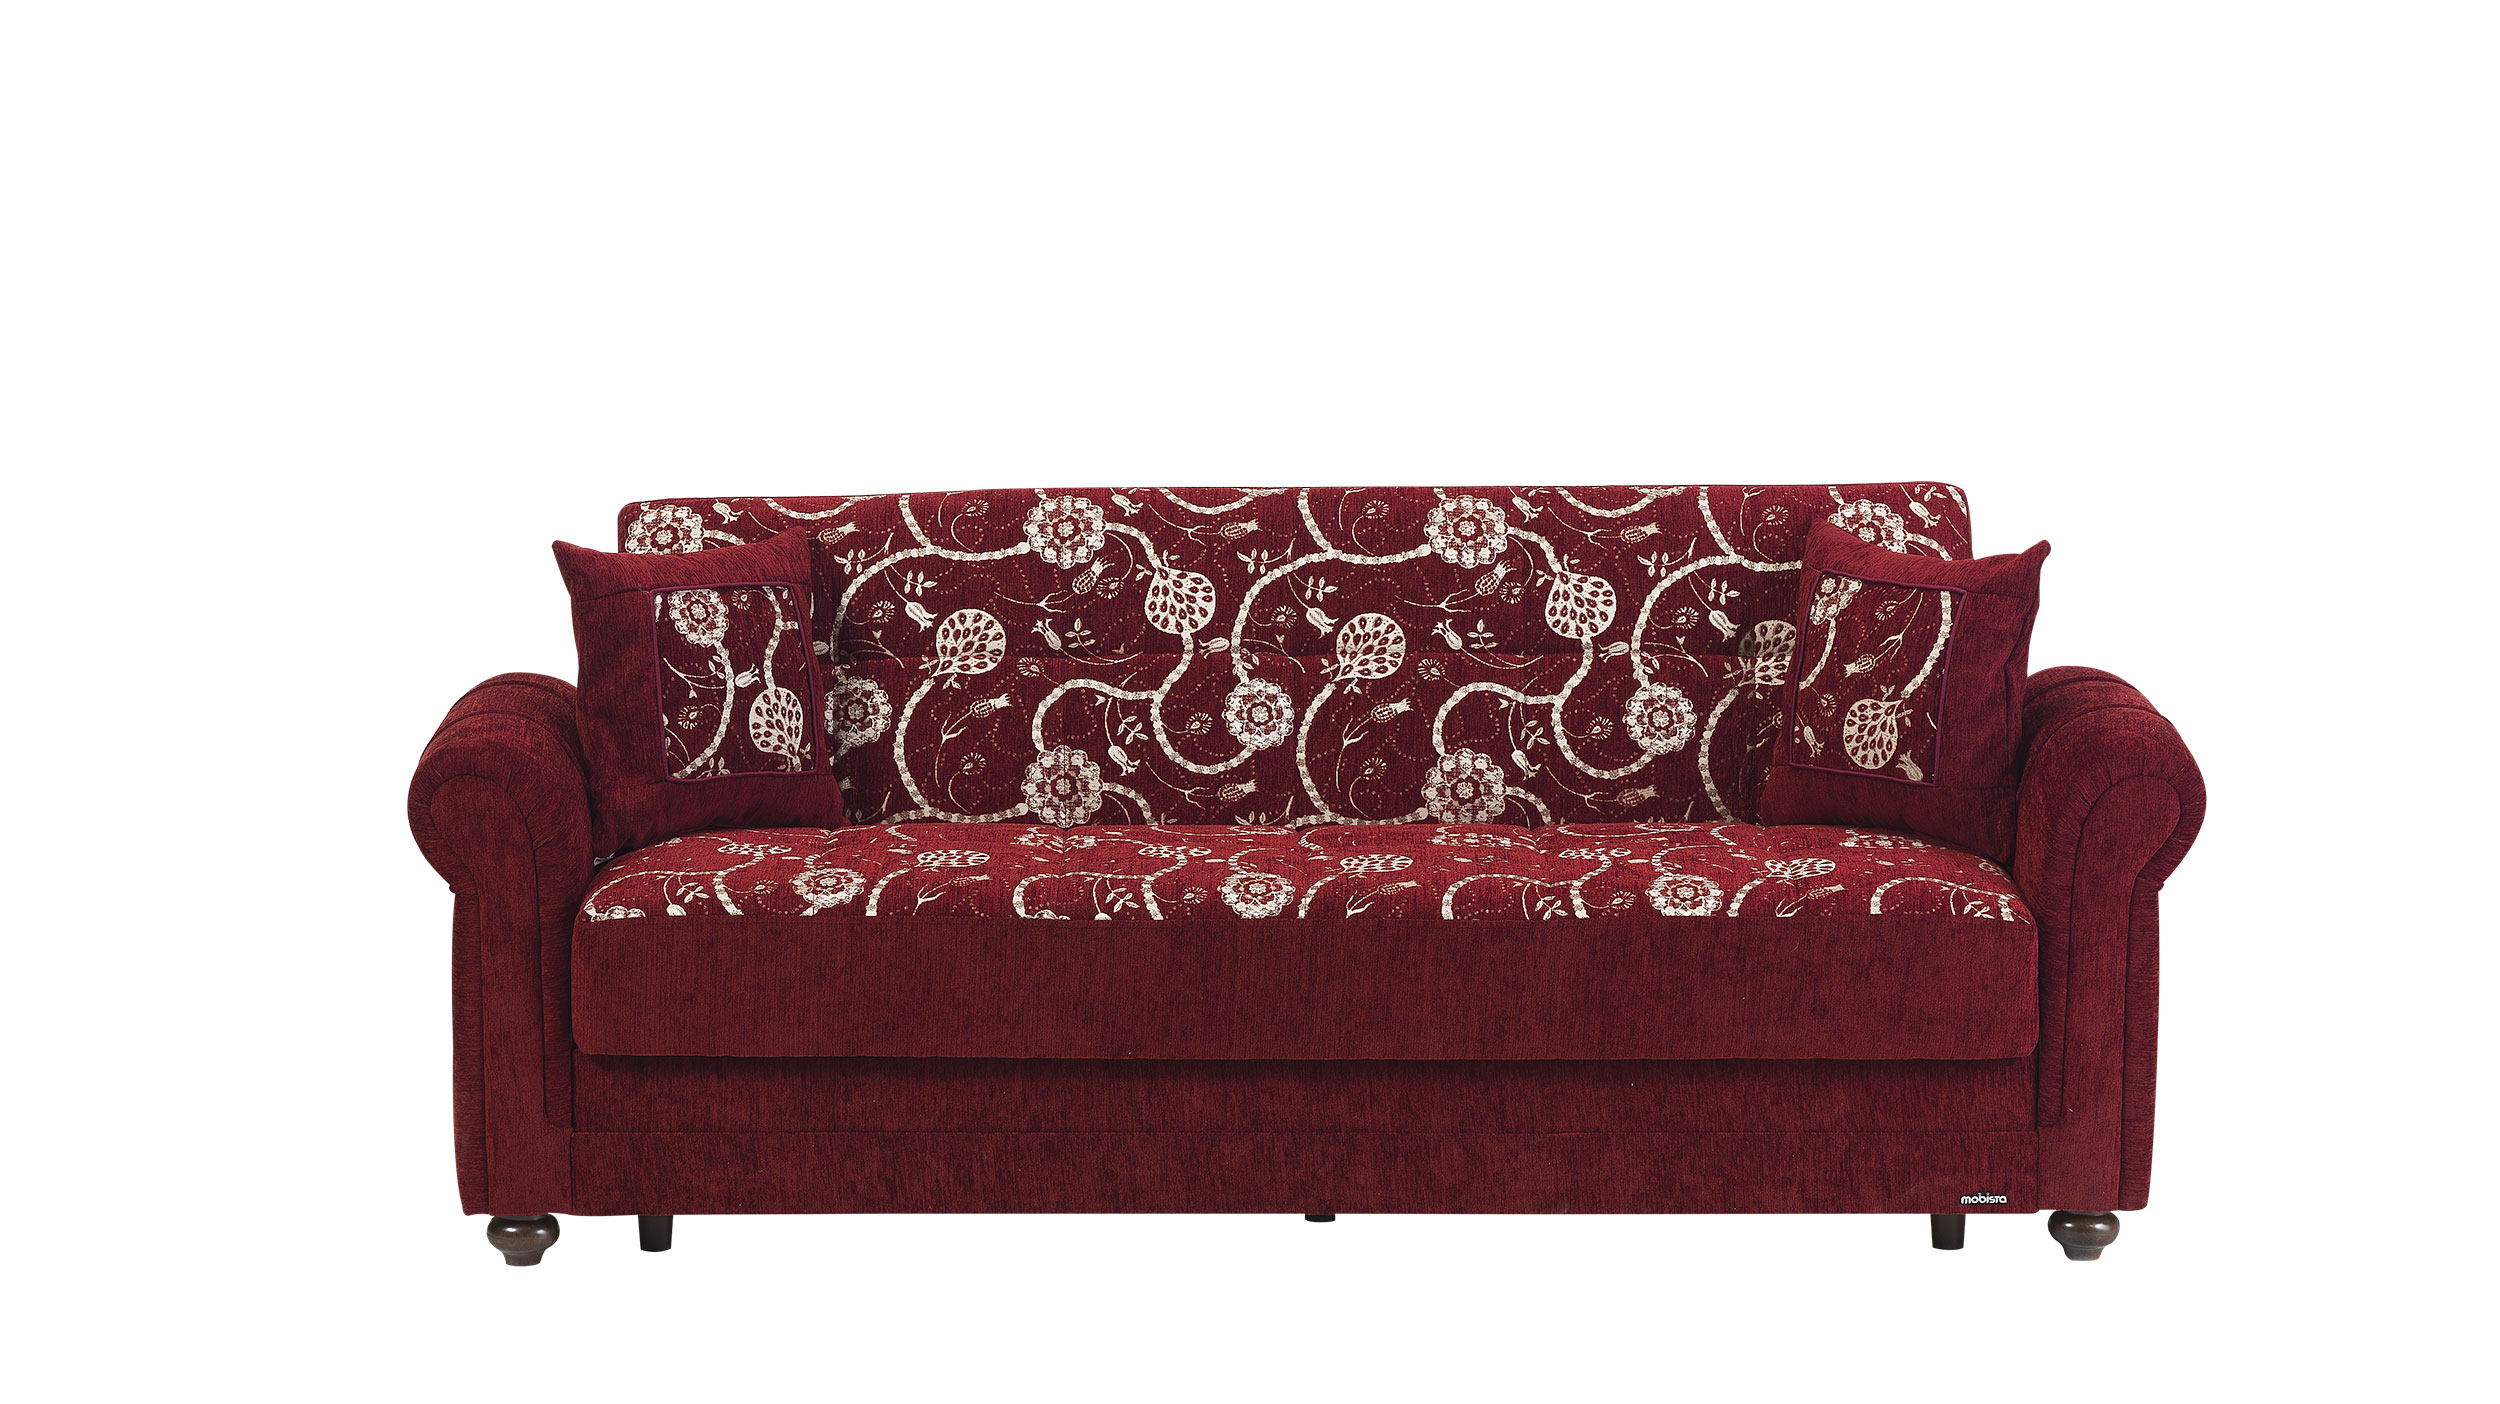 Regina Home Burgundy Sofa Bed by Mobista